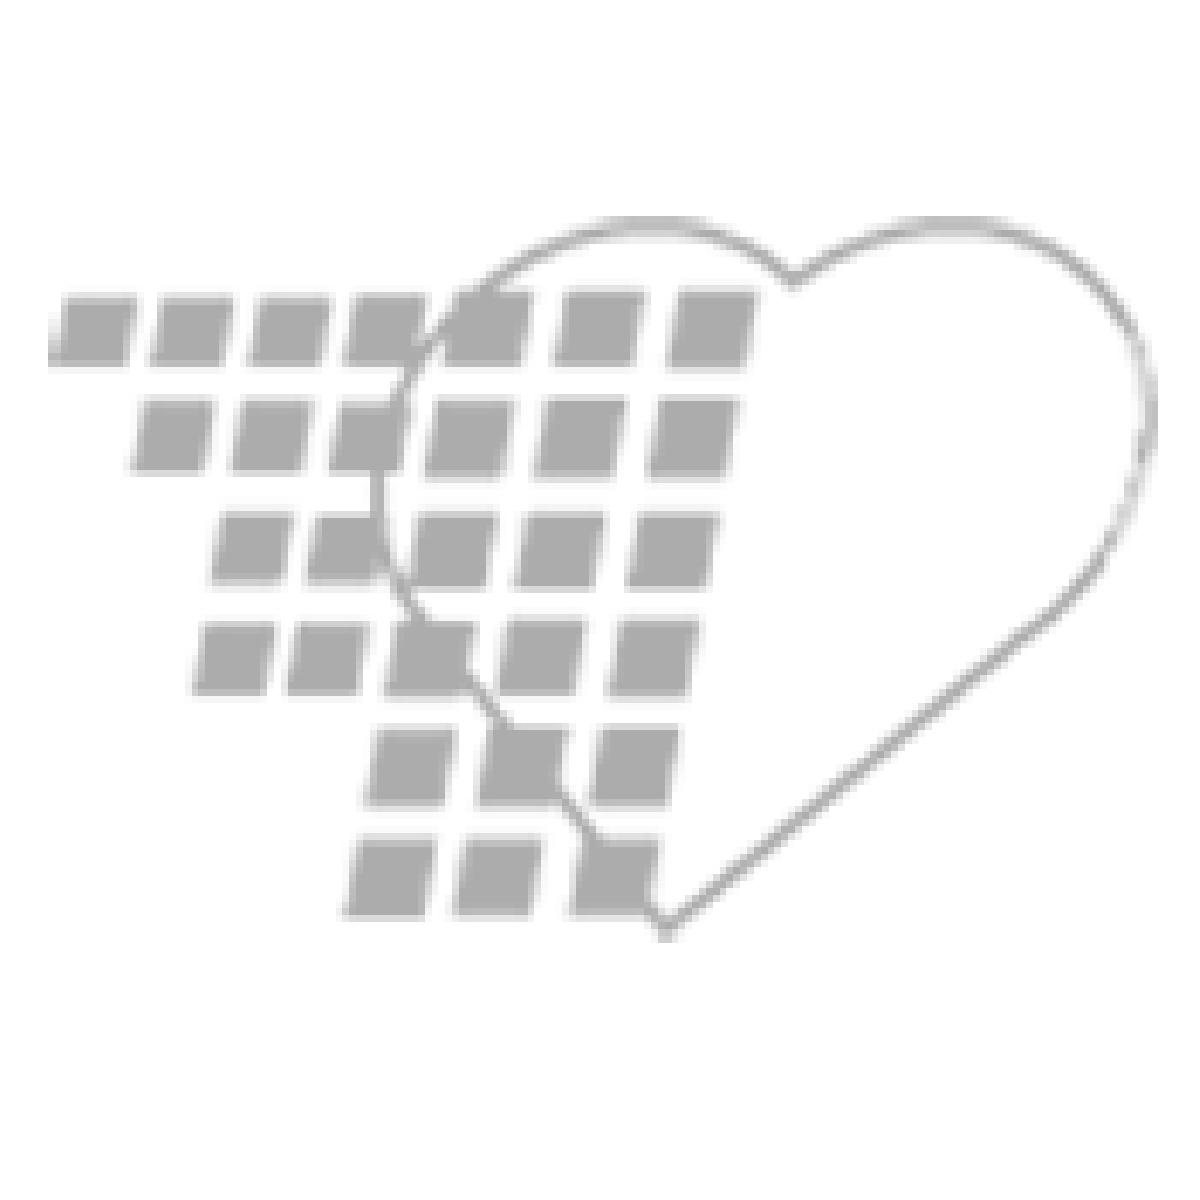 03-85-8060 - Innovative Healthcare Corporation DermAssist® Dry Wipes